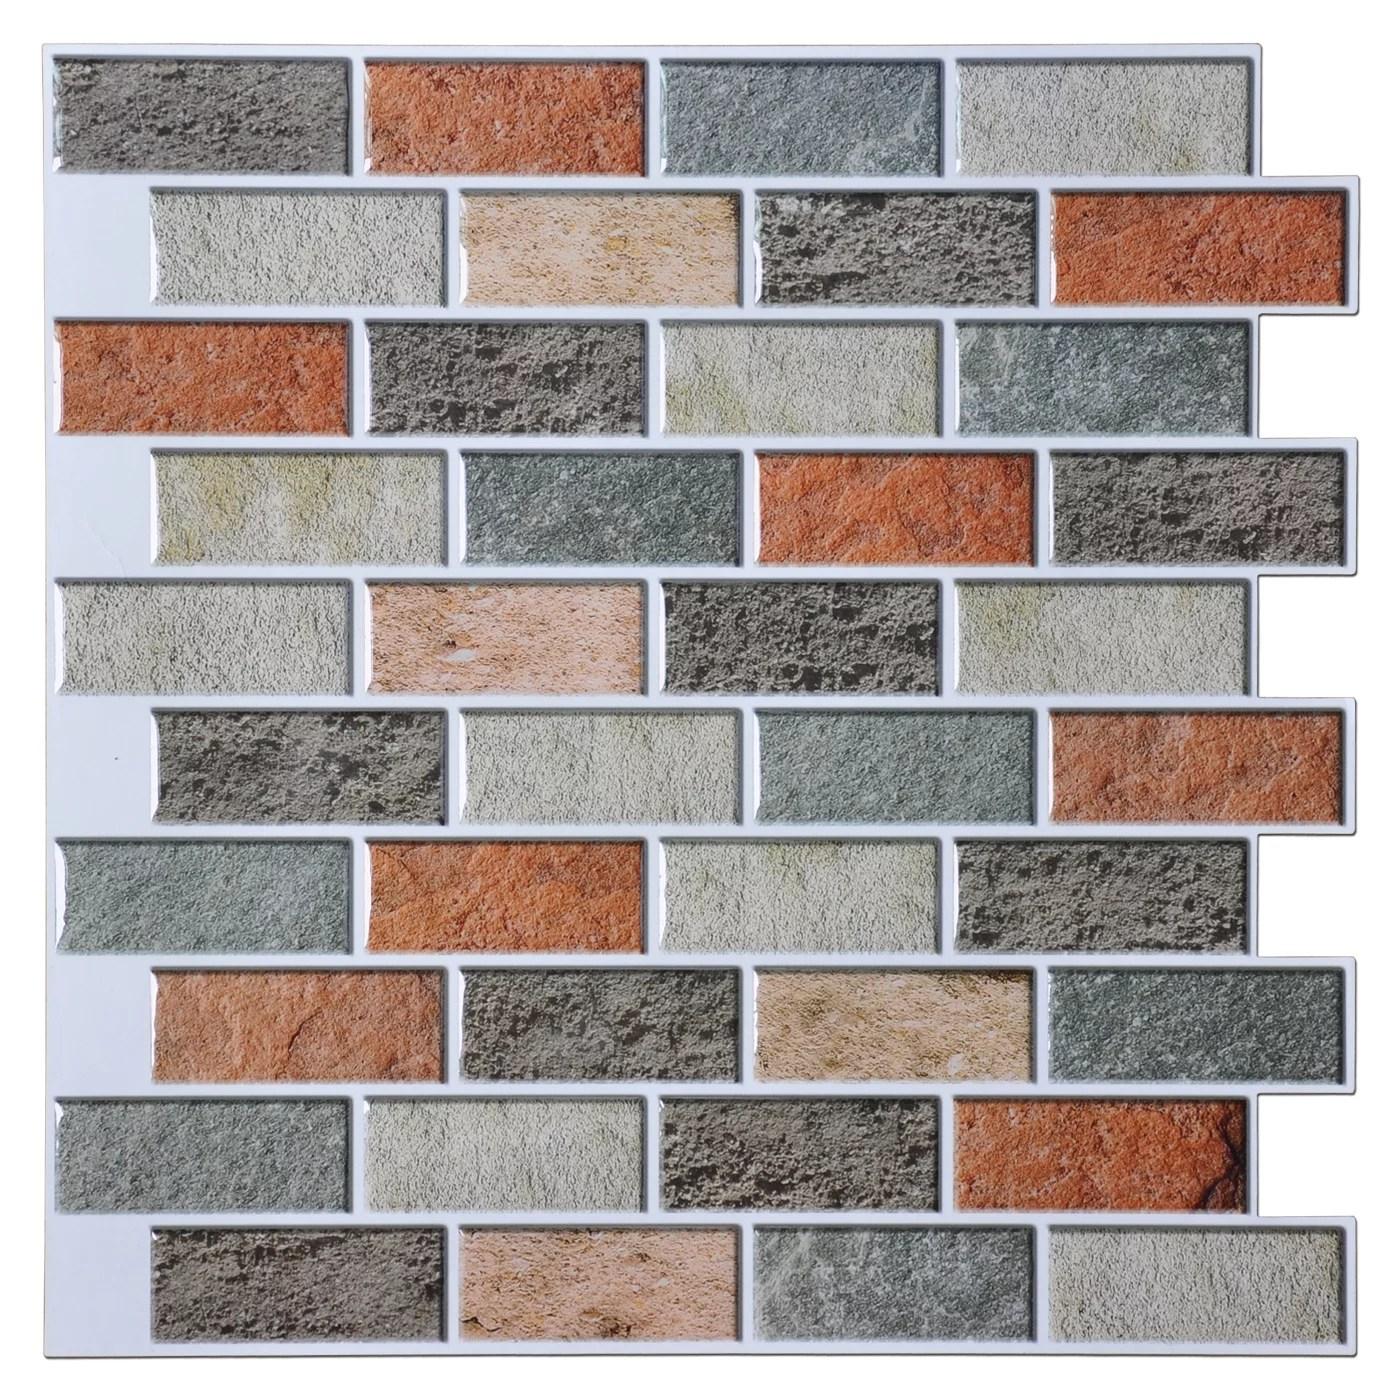 art3d peel and stick kitchen backsplash self adhesive subway tile 12 x12 faux stone mosaic 10 pack